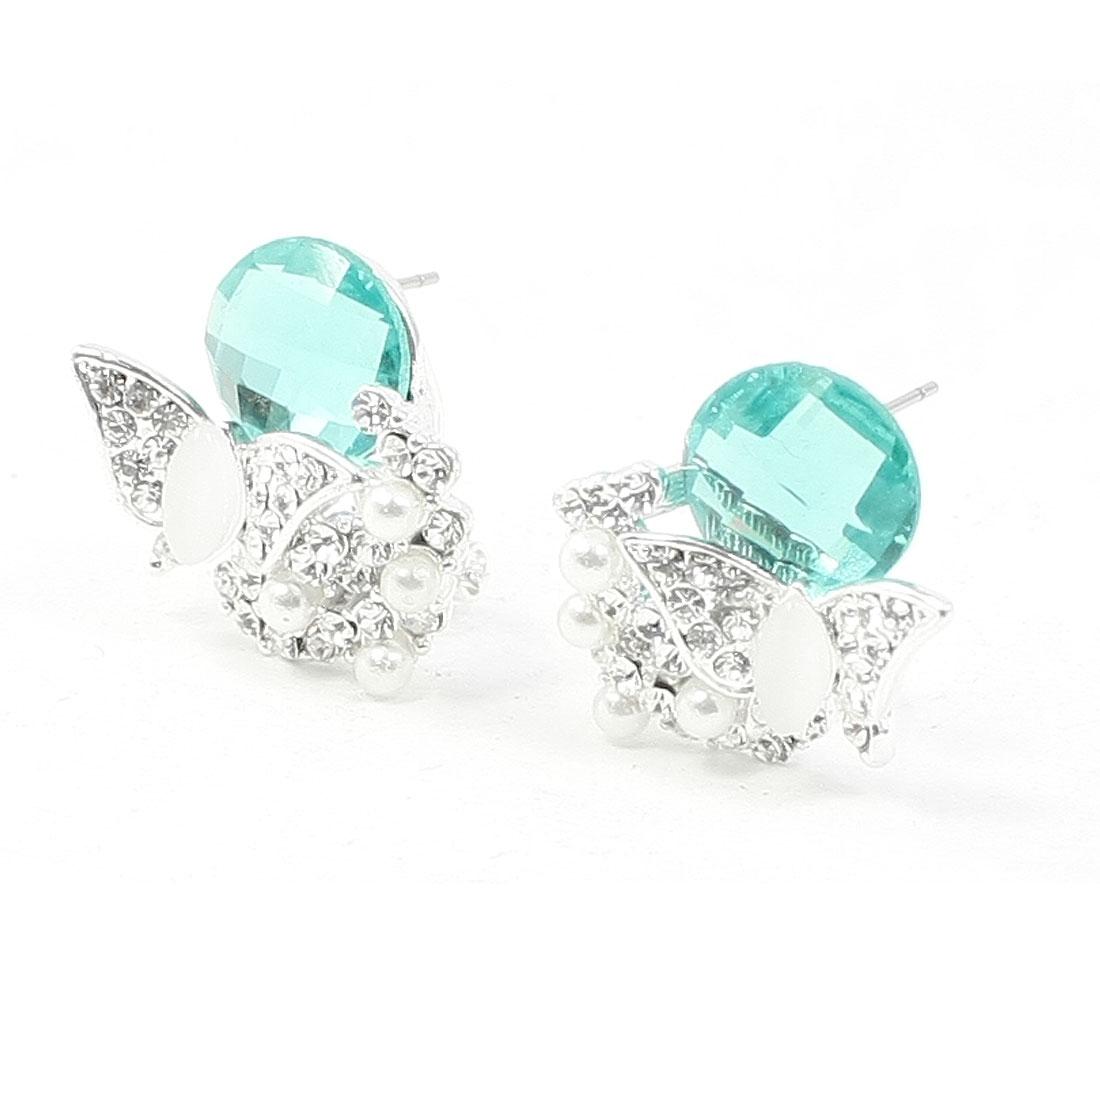 Women Light Blue Rhinestone Inlaid Faux Crystal Decor Silver Tone Butterfly Design Earrings